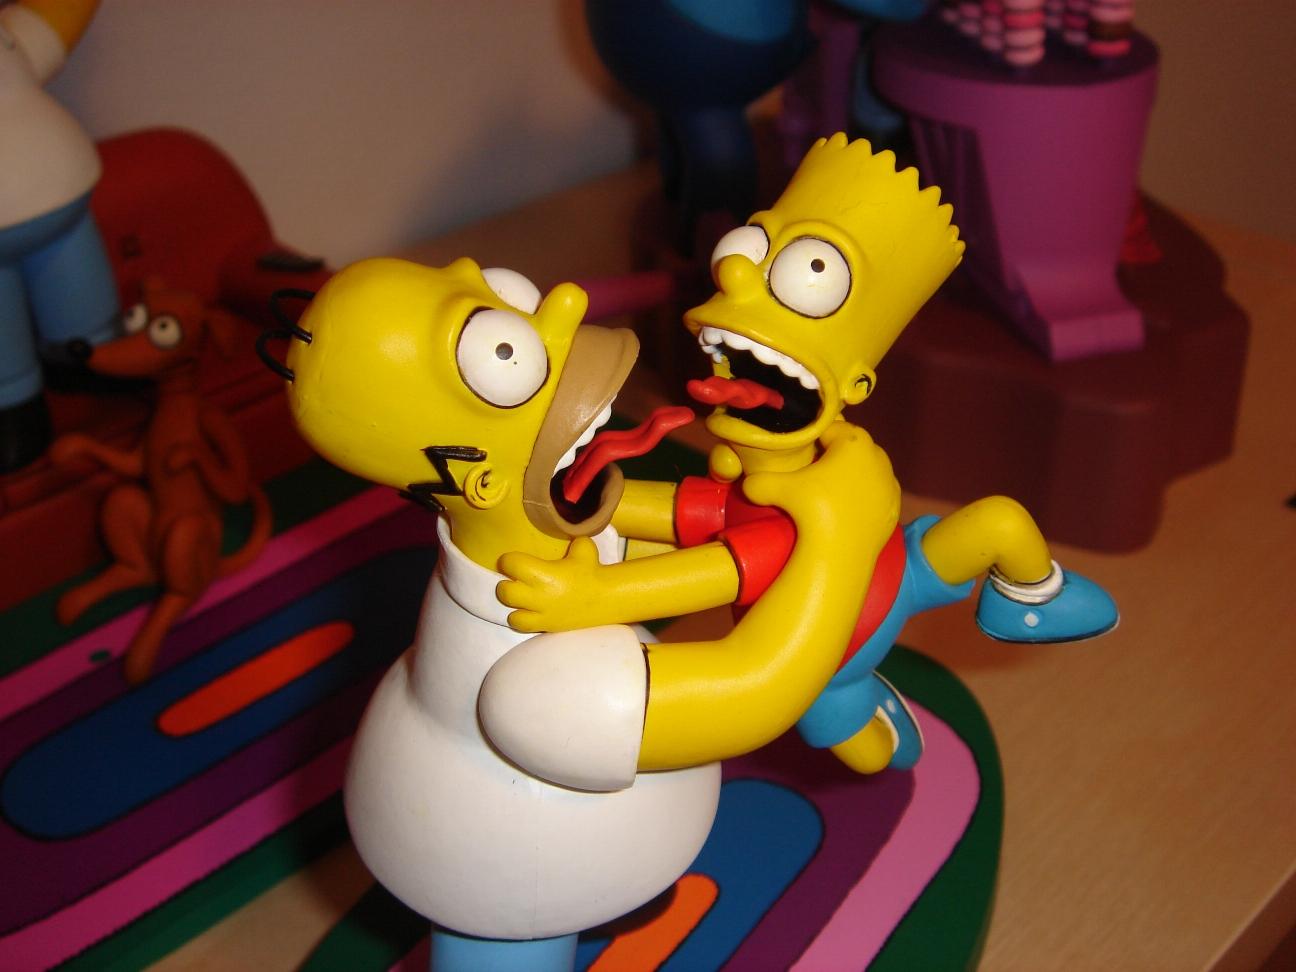 las mejores imagenes de bart simpson - Taringa!